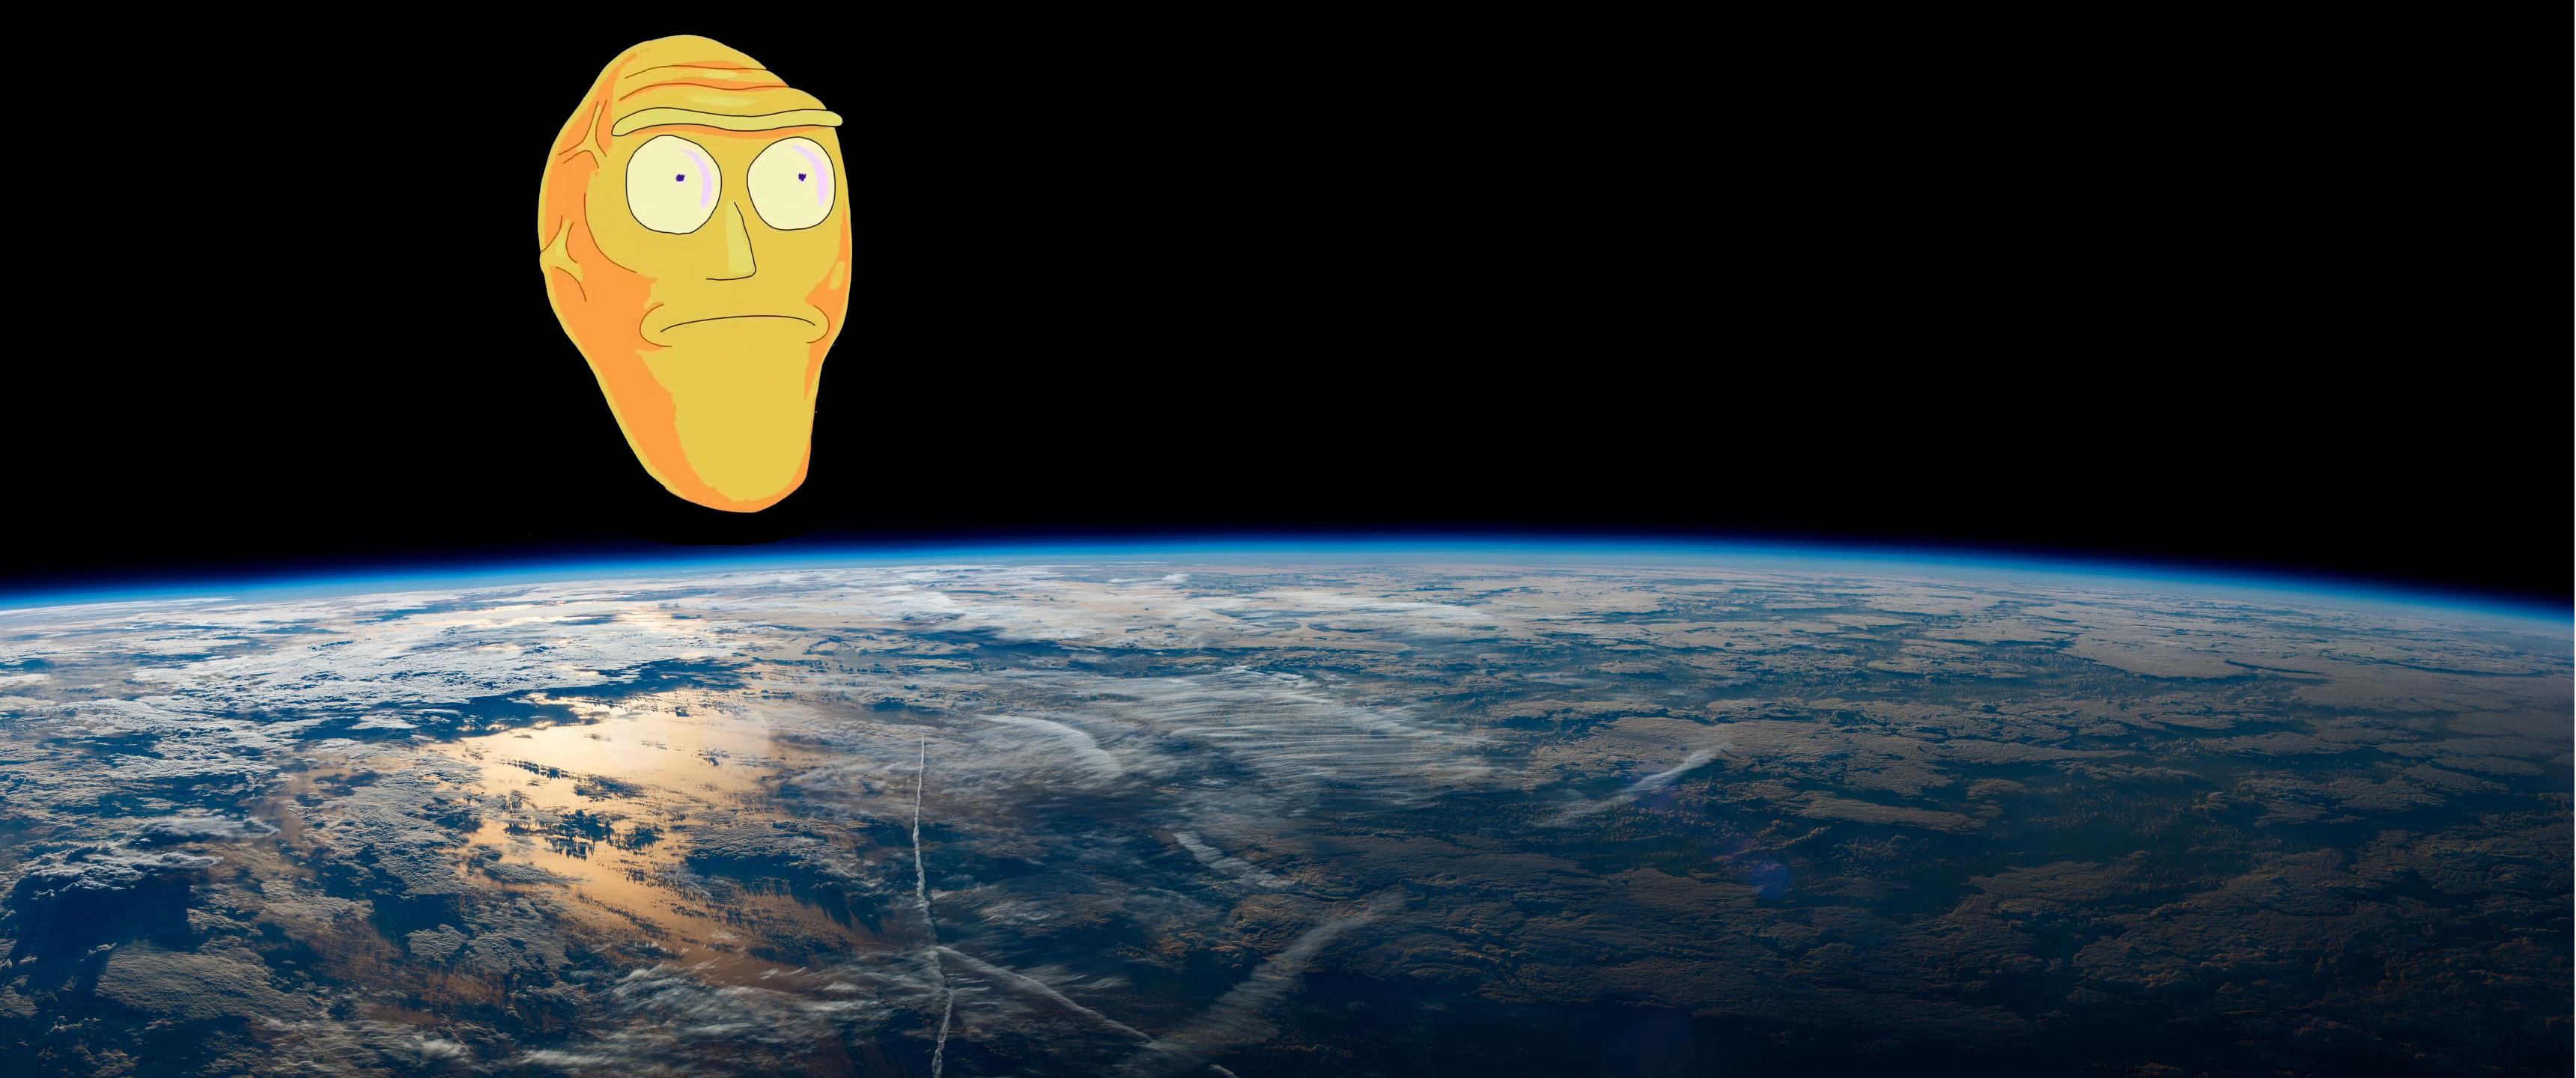 Gravity Falls Wallpaper Imgur 3440 X 1440 Wallpaper 66 Images